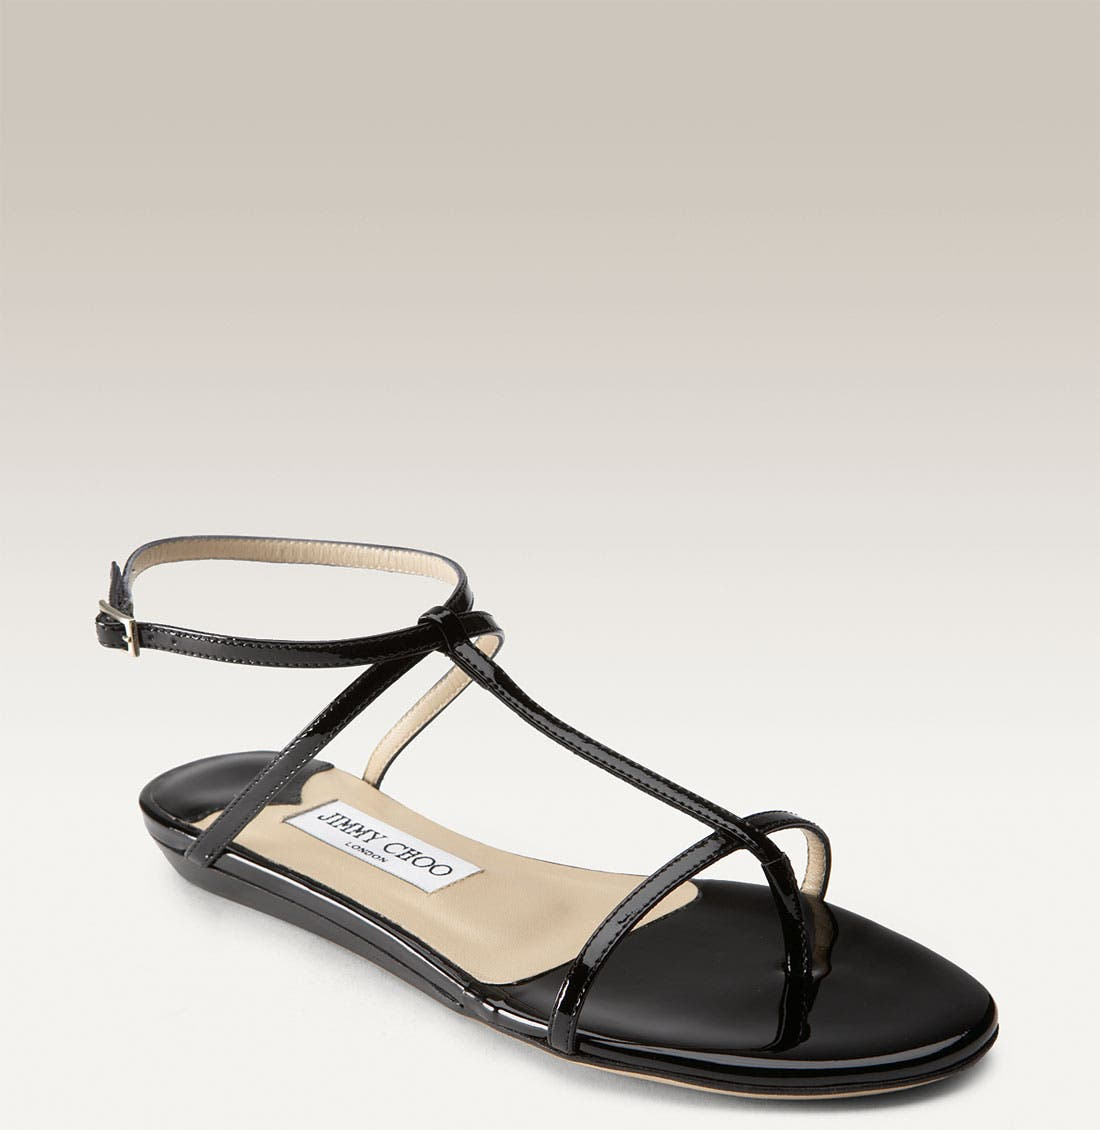 Alternate Image 1 Selected - Jimmy Choo 'Fiona' T-Strap Sandal